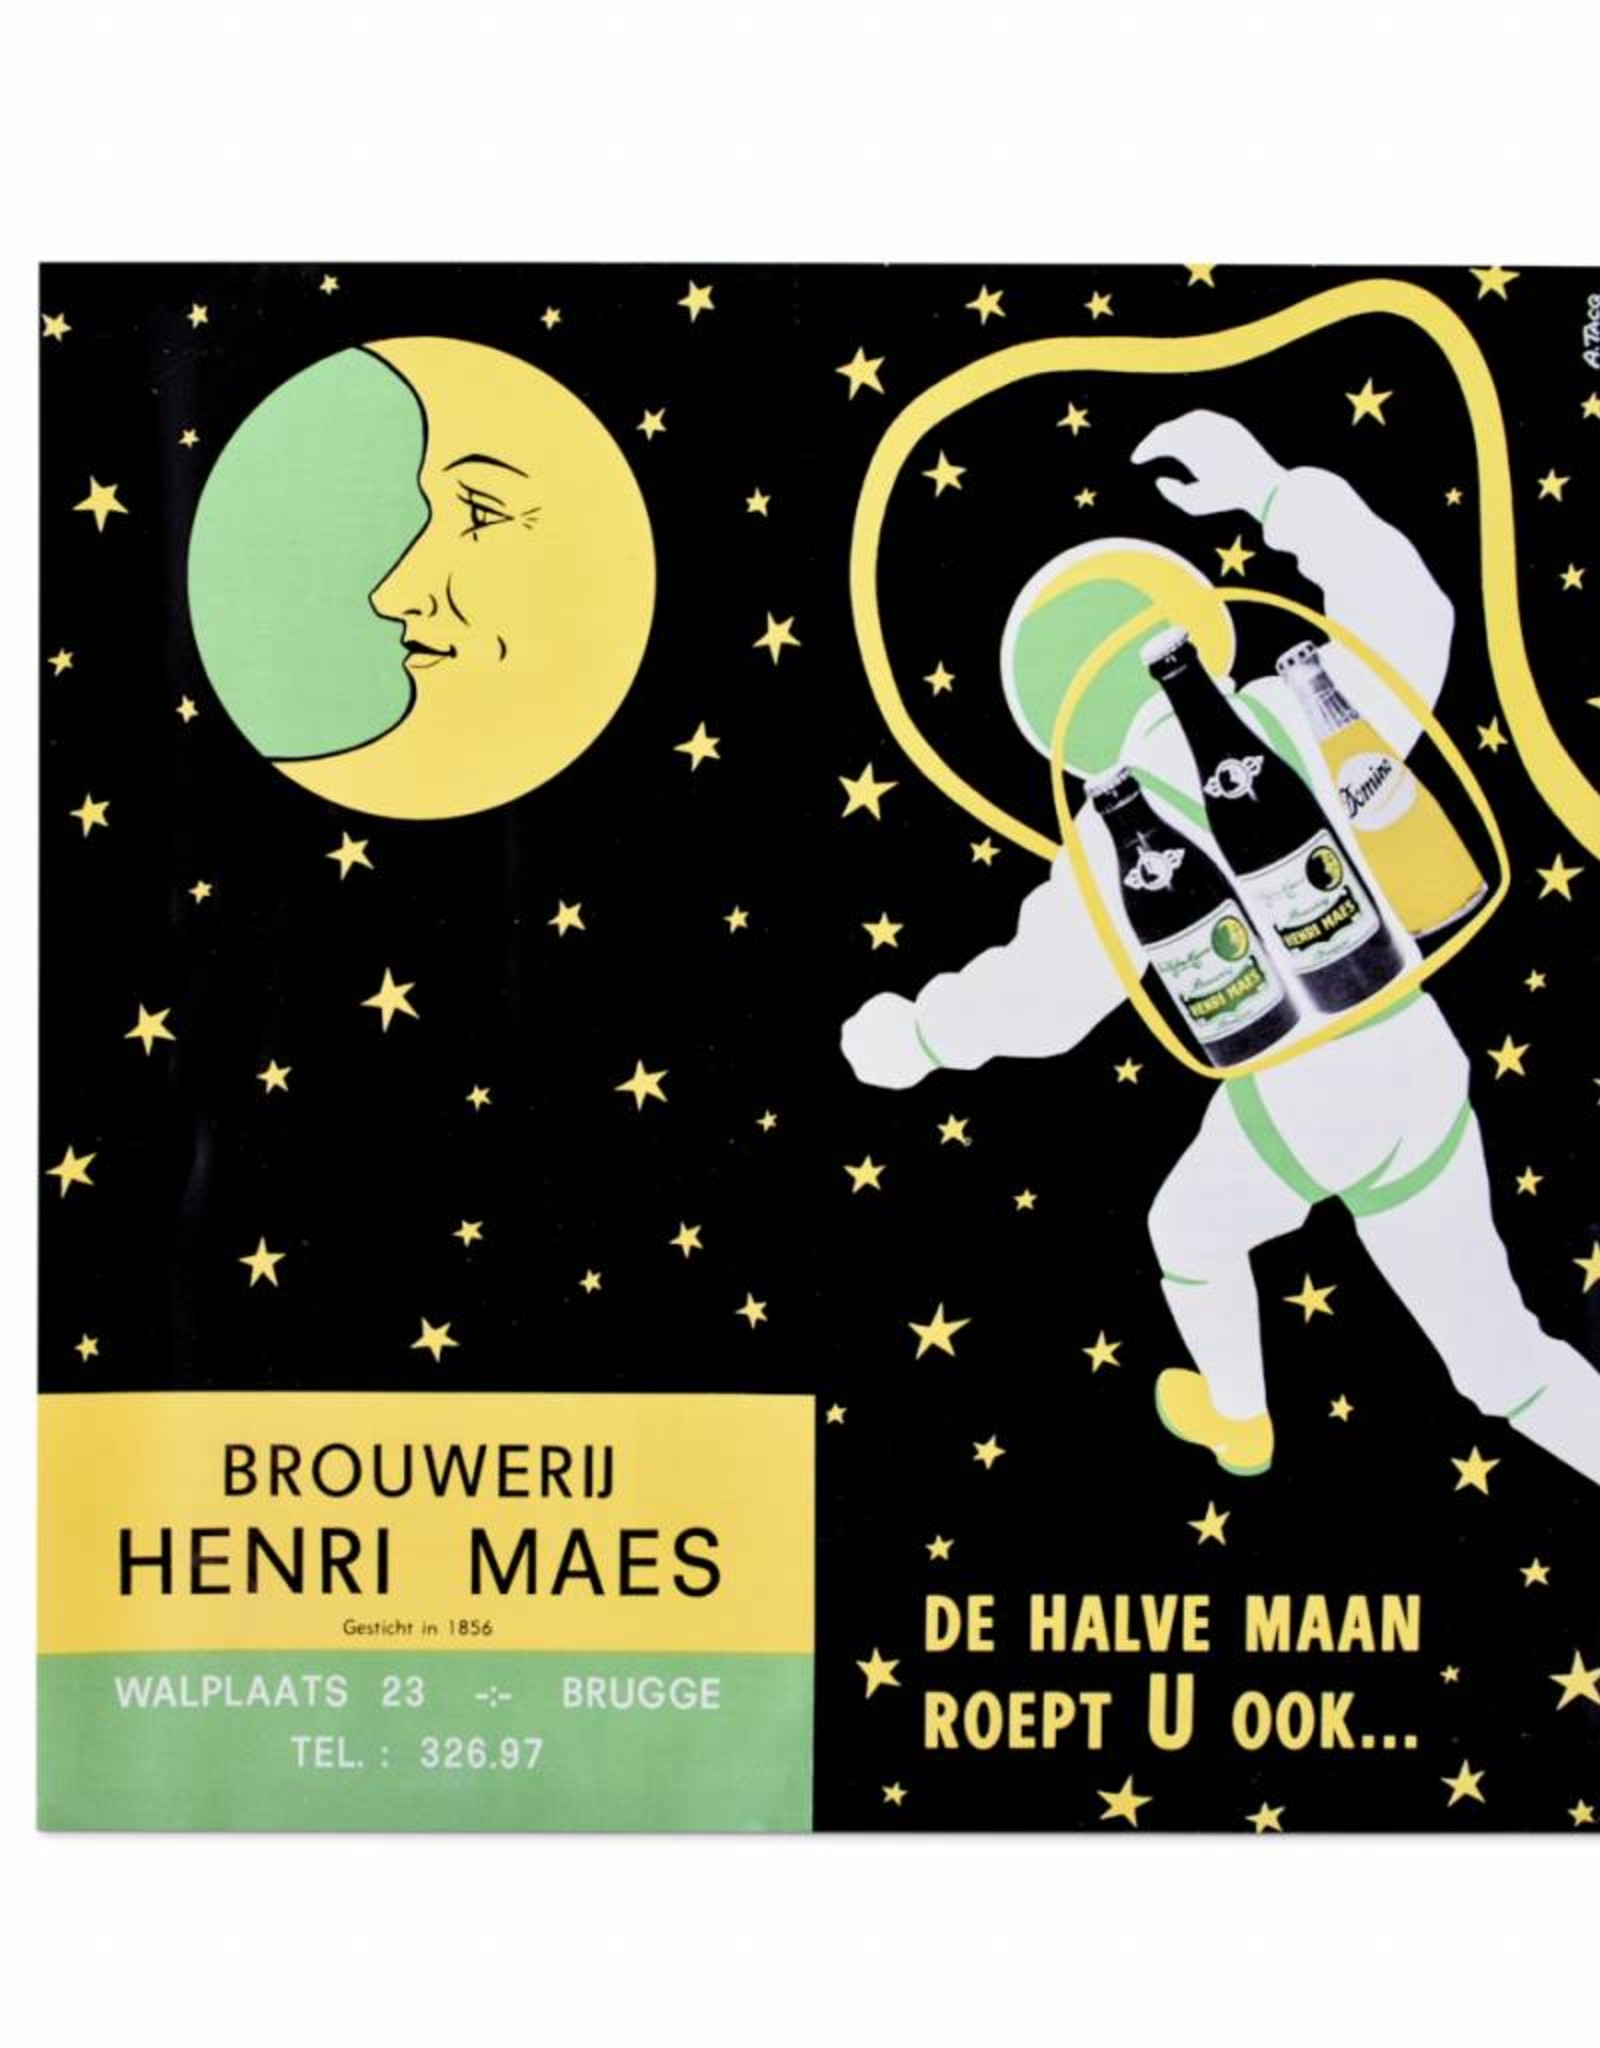 Henri Maes ruimte poster